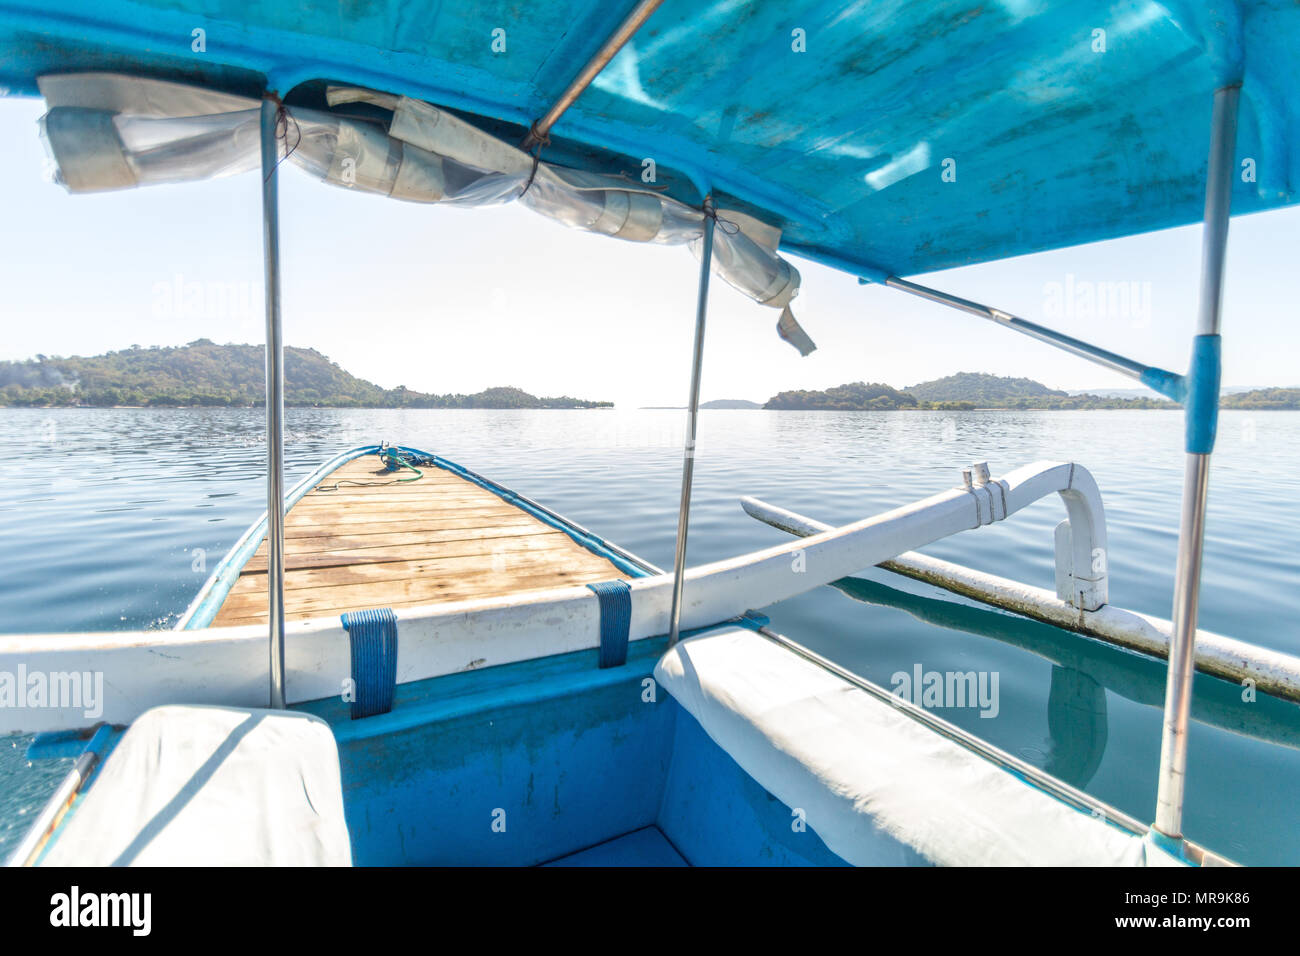 Boat trip, Gili island, Indonesia - Stock Image